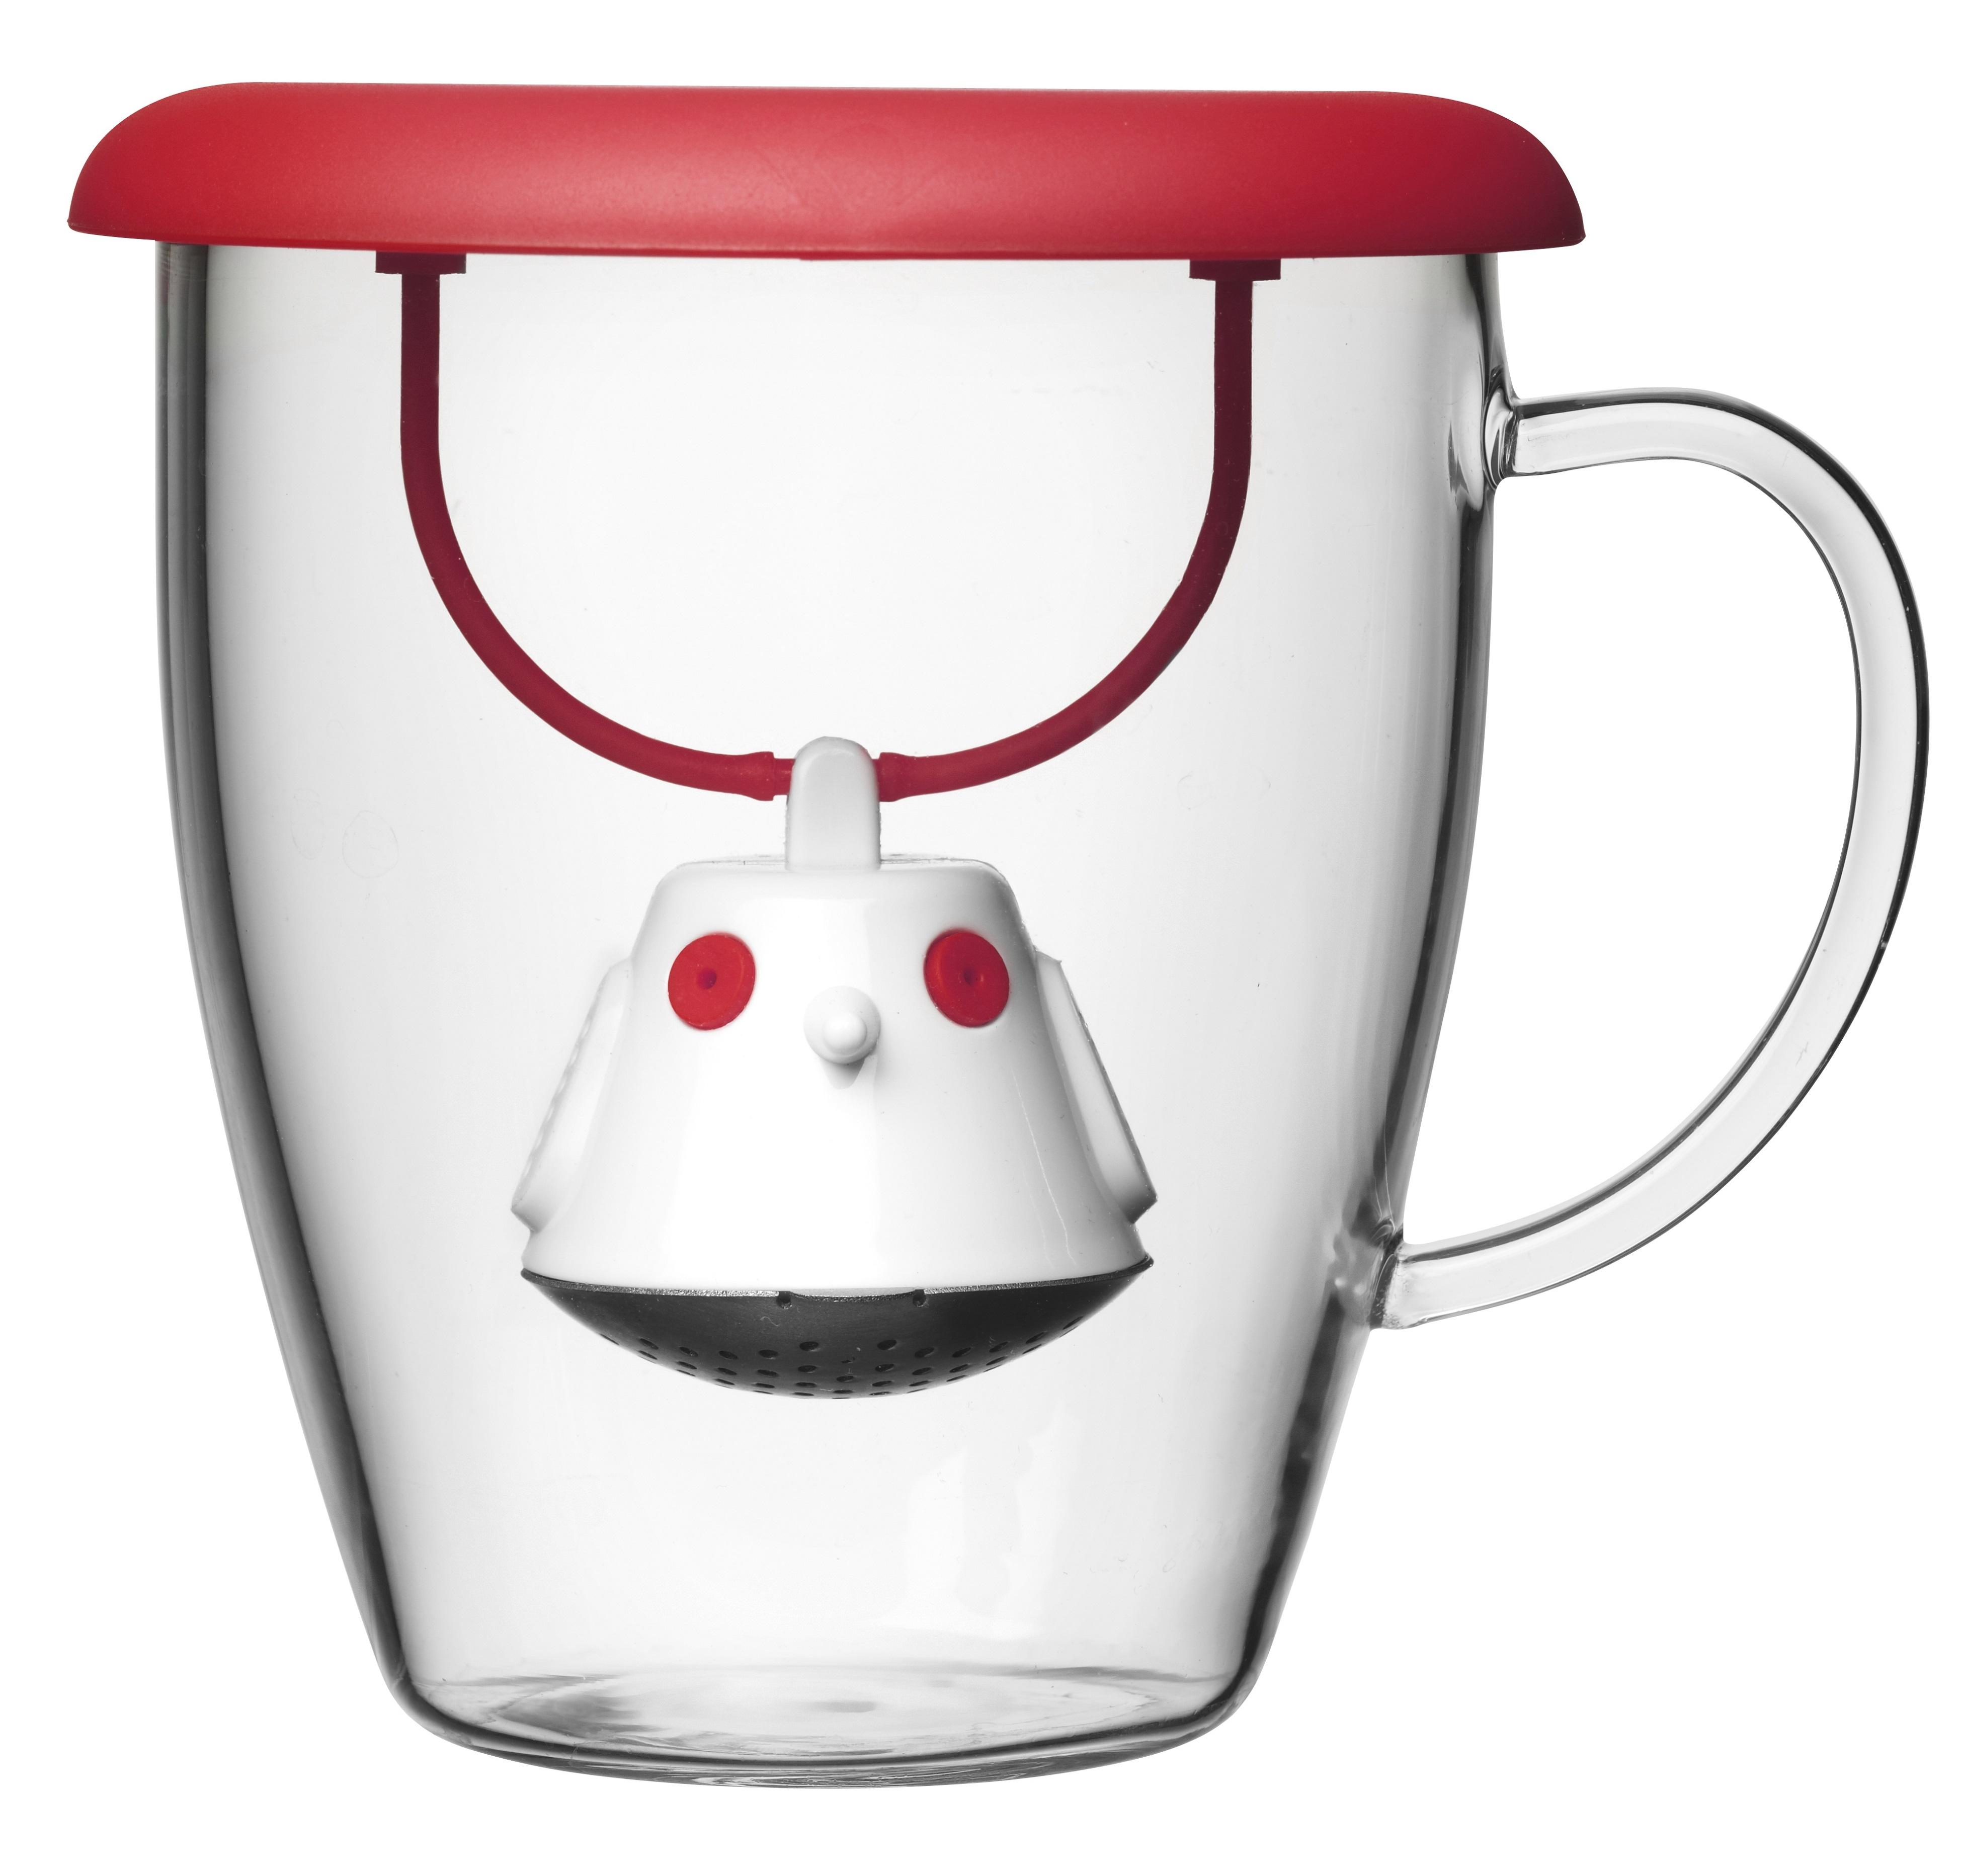 Cana Ceai Cu Infuzor Si Capac Birdie Red, Qdo, Ø 10,6 Cm